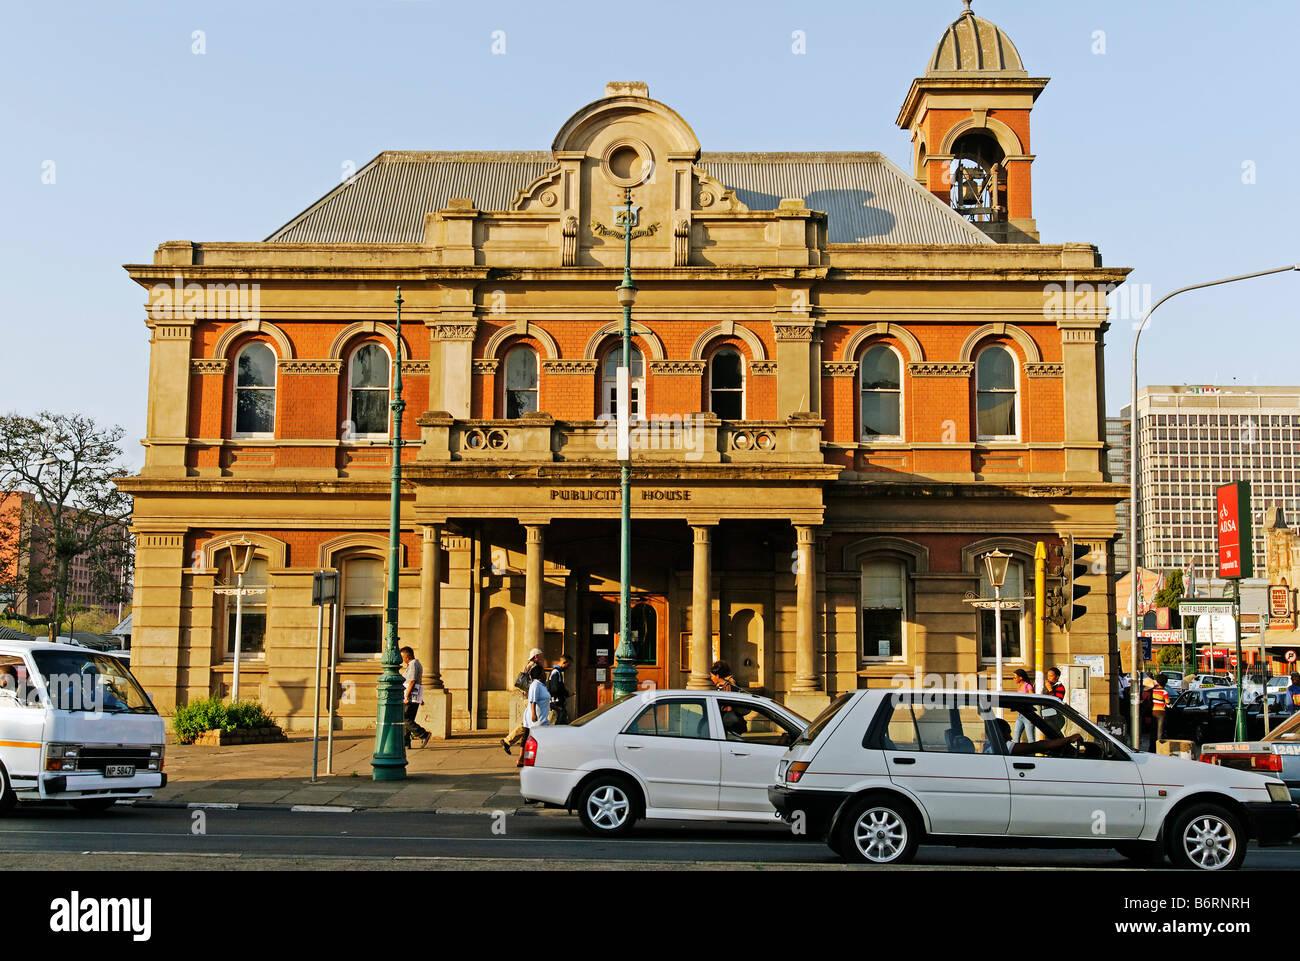 Tourist-Information, Pietermaritzburg, Kwazulu-Natal, South Africa, Africa Stock Photo